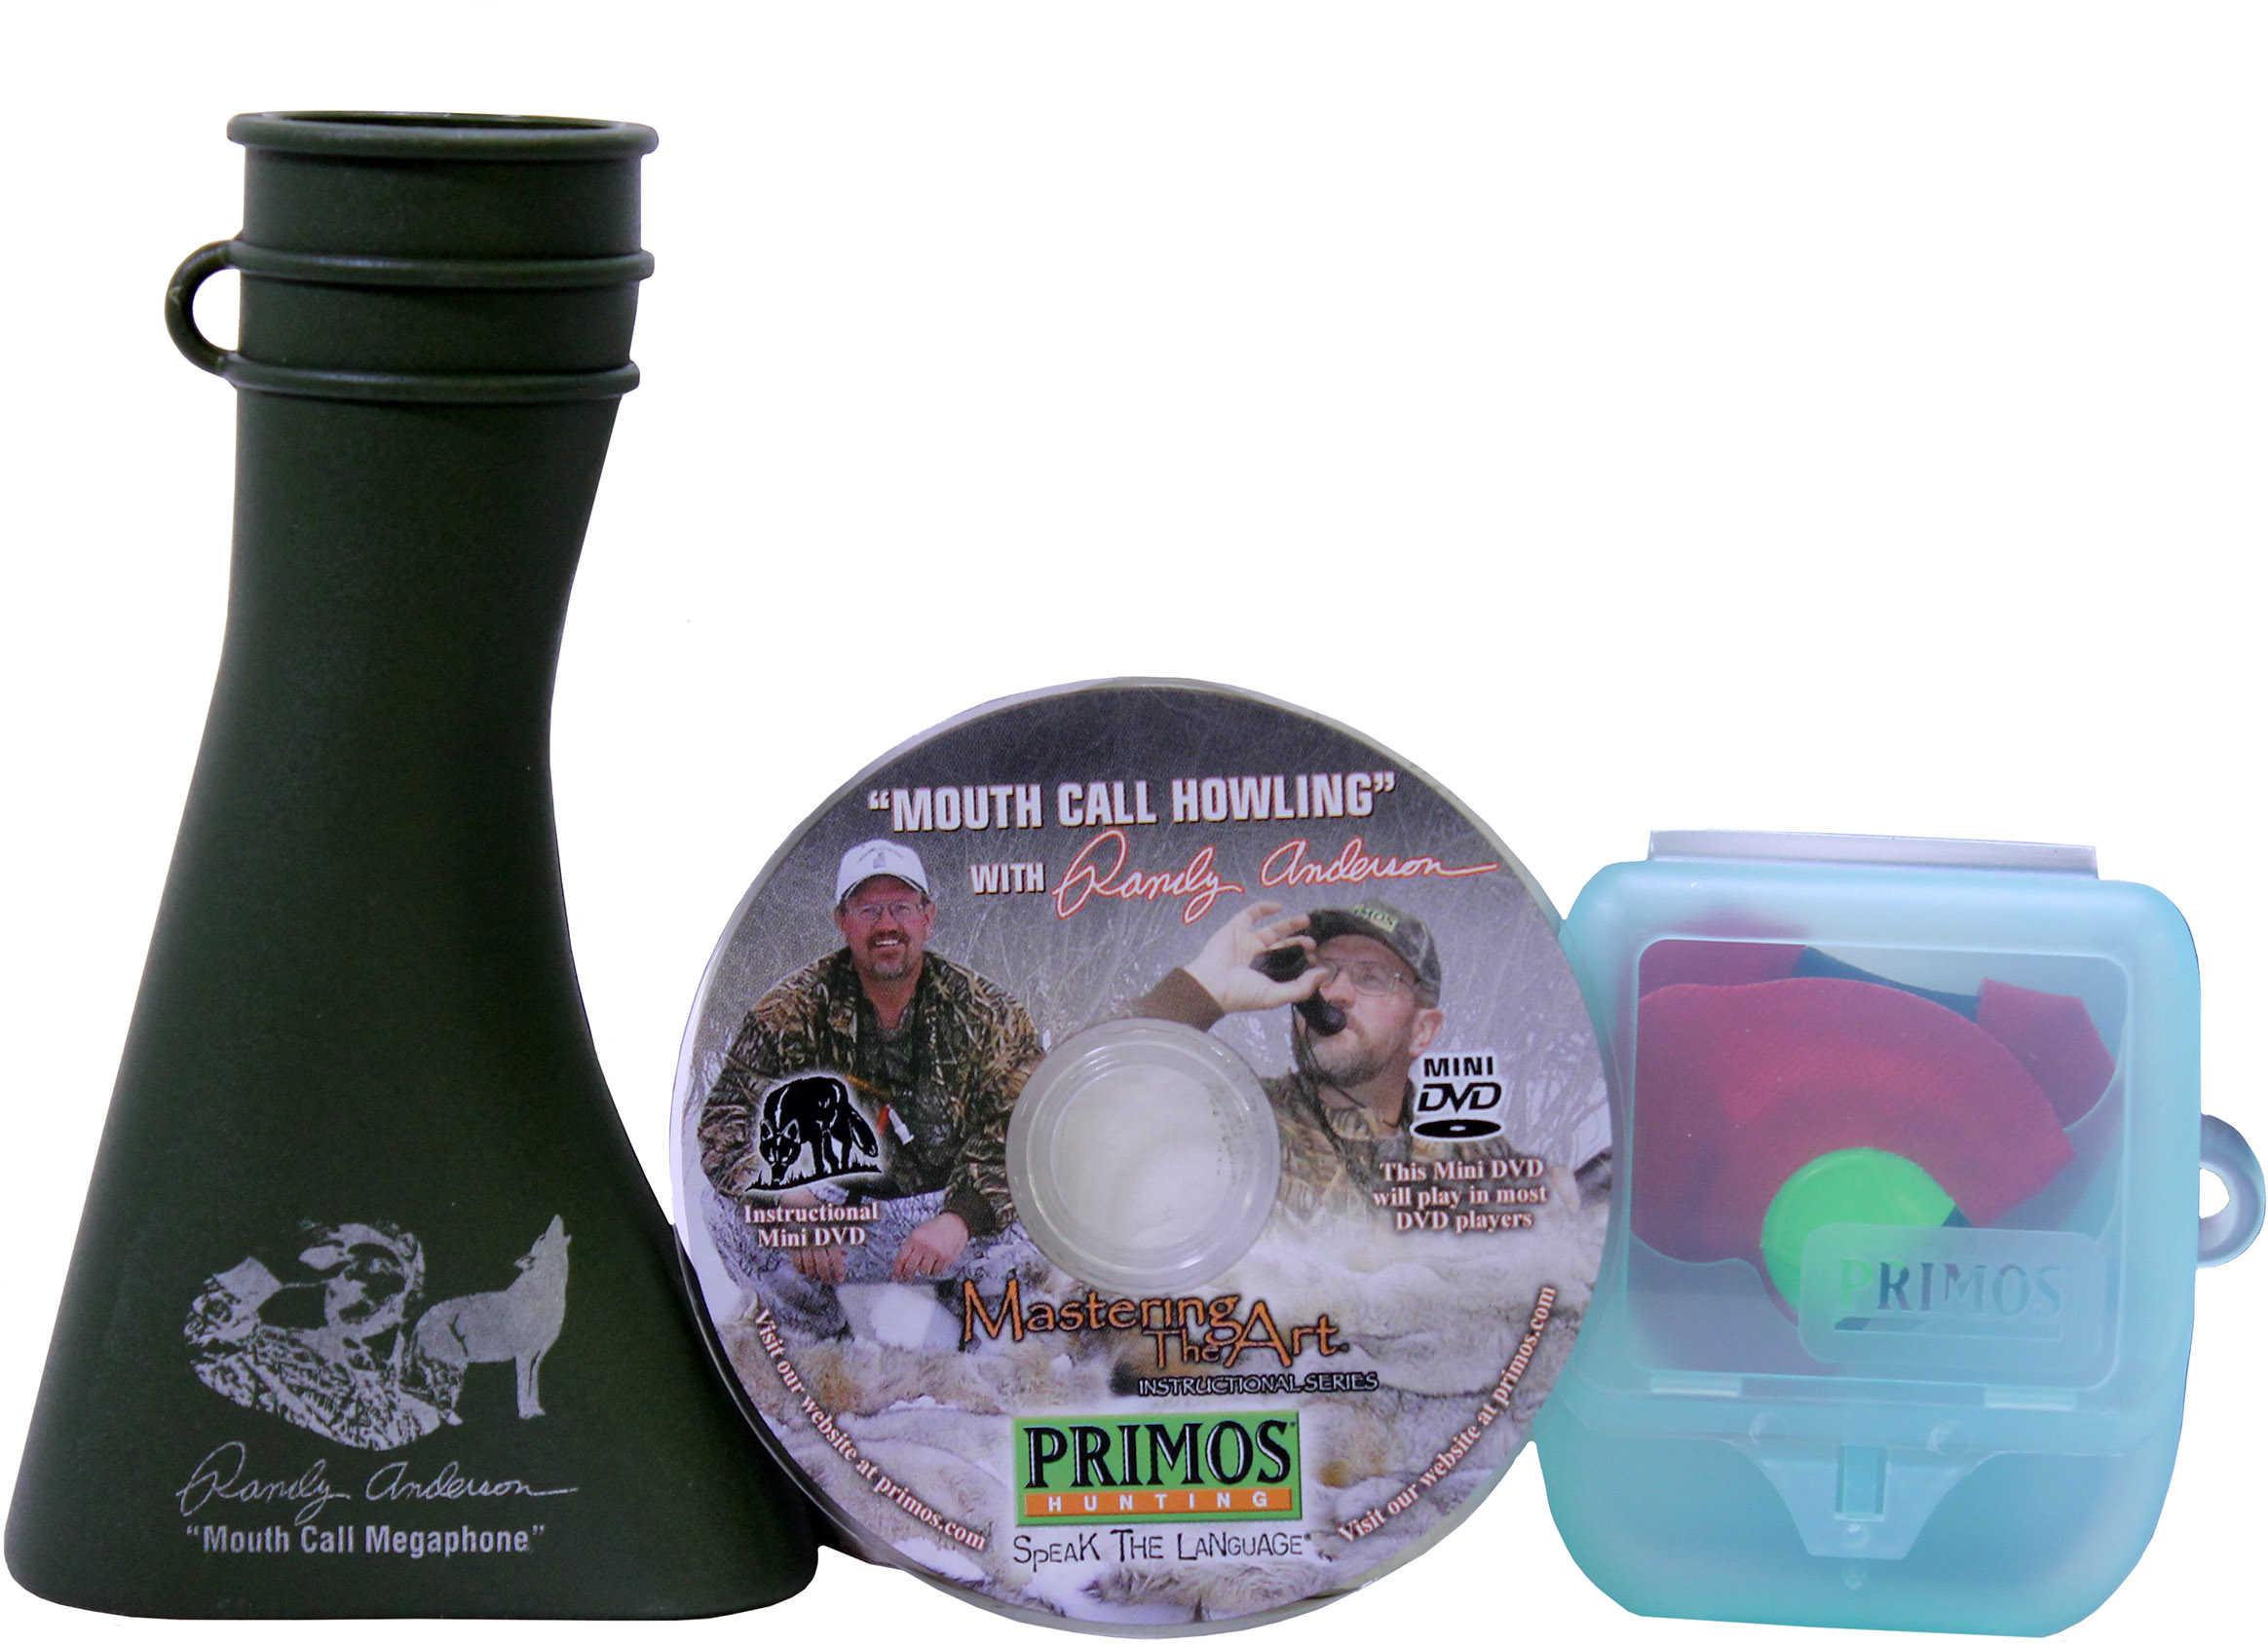 Primos Predator Call Randy Anderson Mouth Call Howler 1724